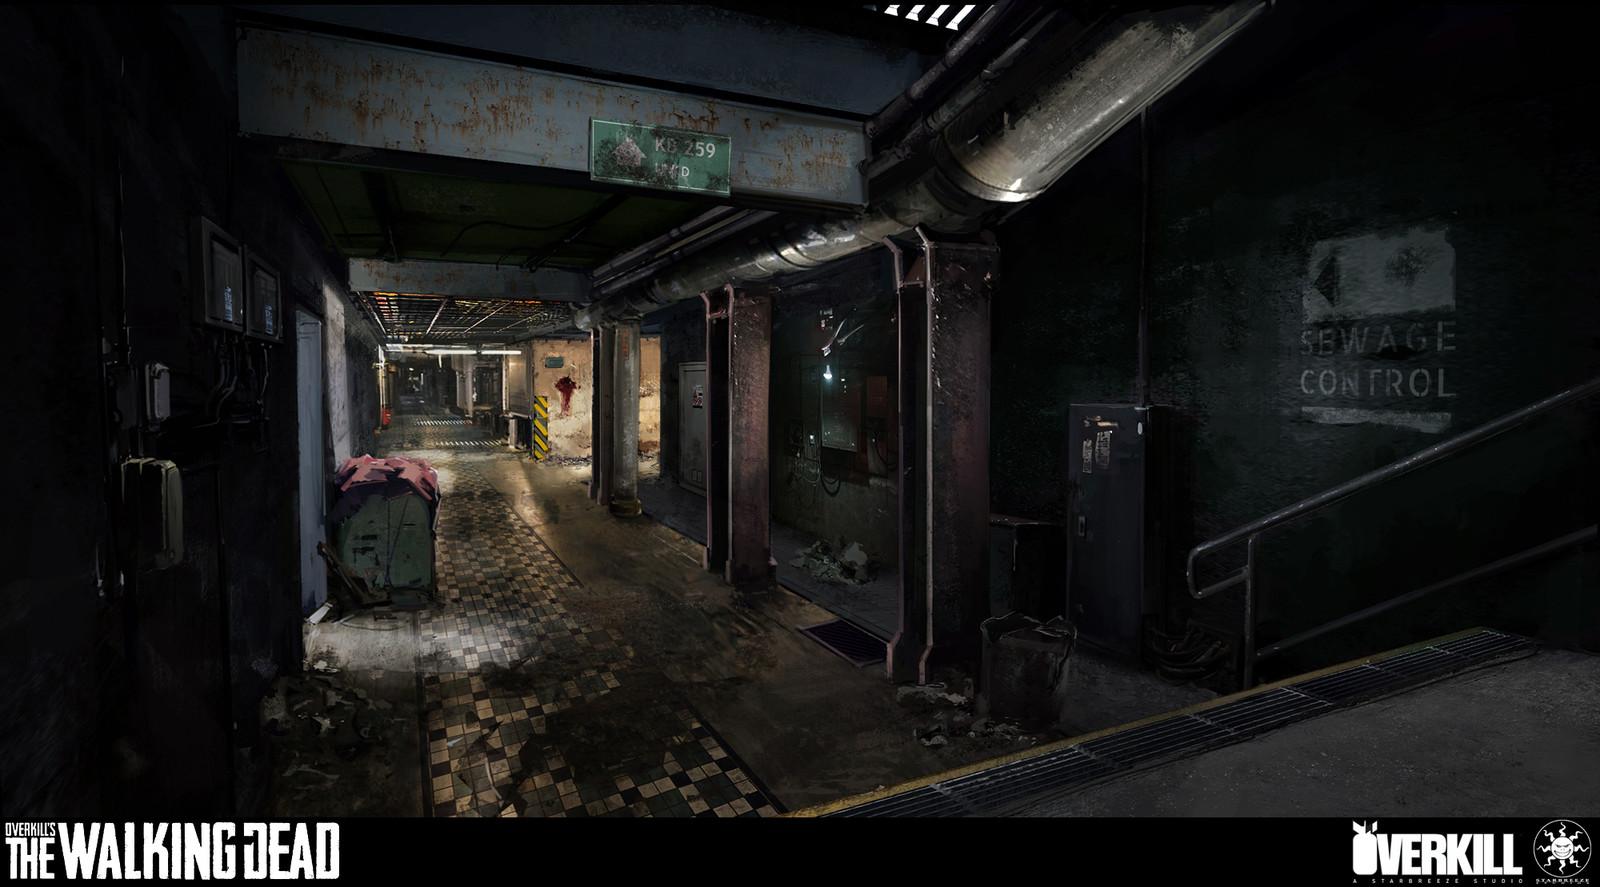 Overkill's The Walking Dead Concept Art (multiple images)